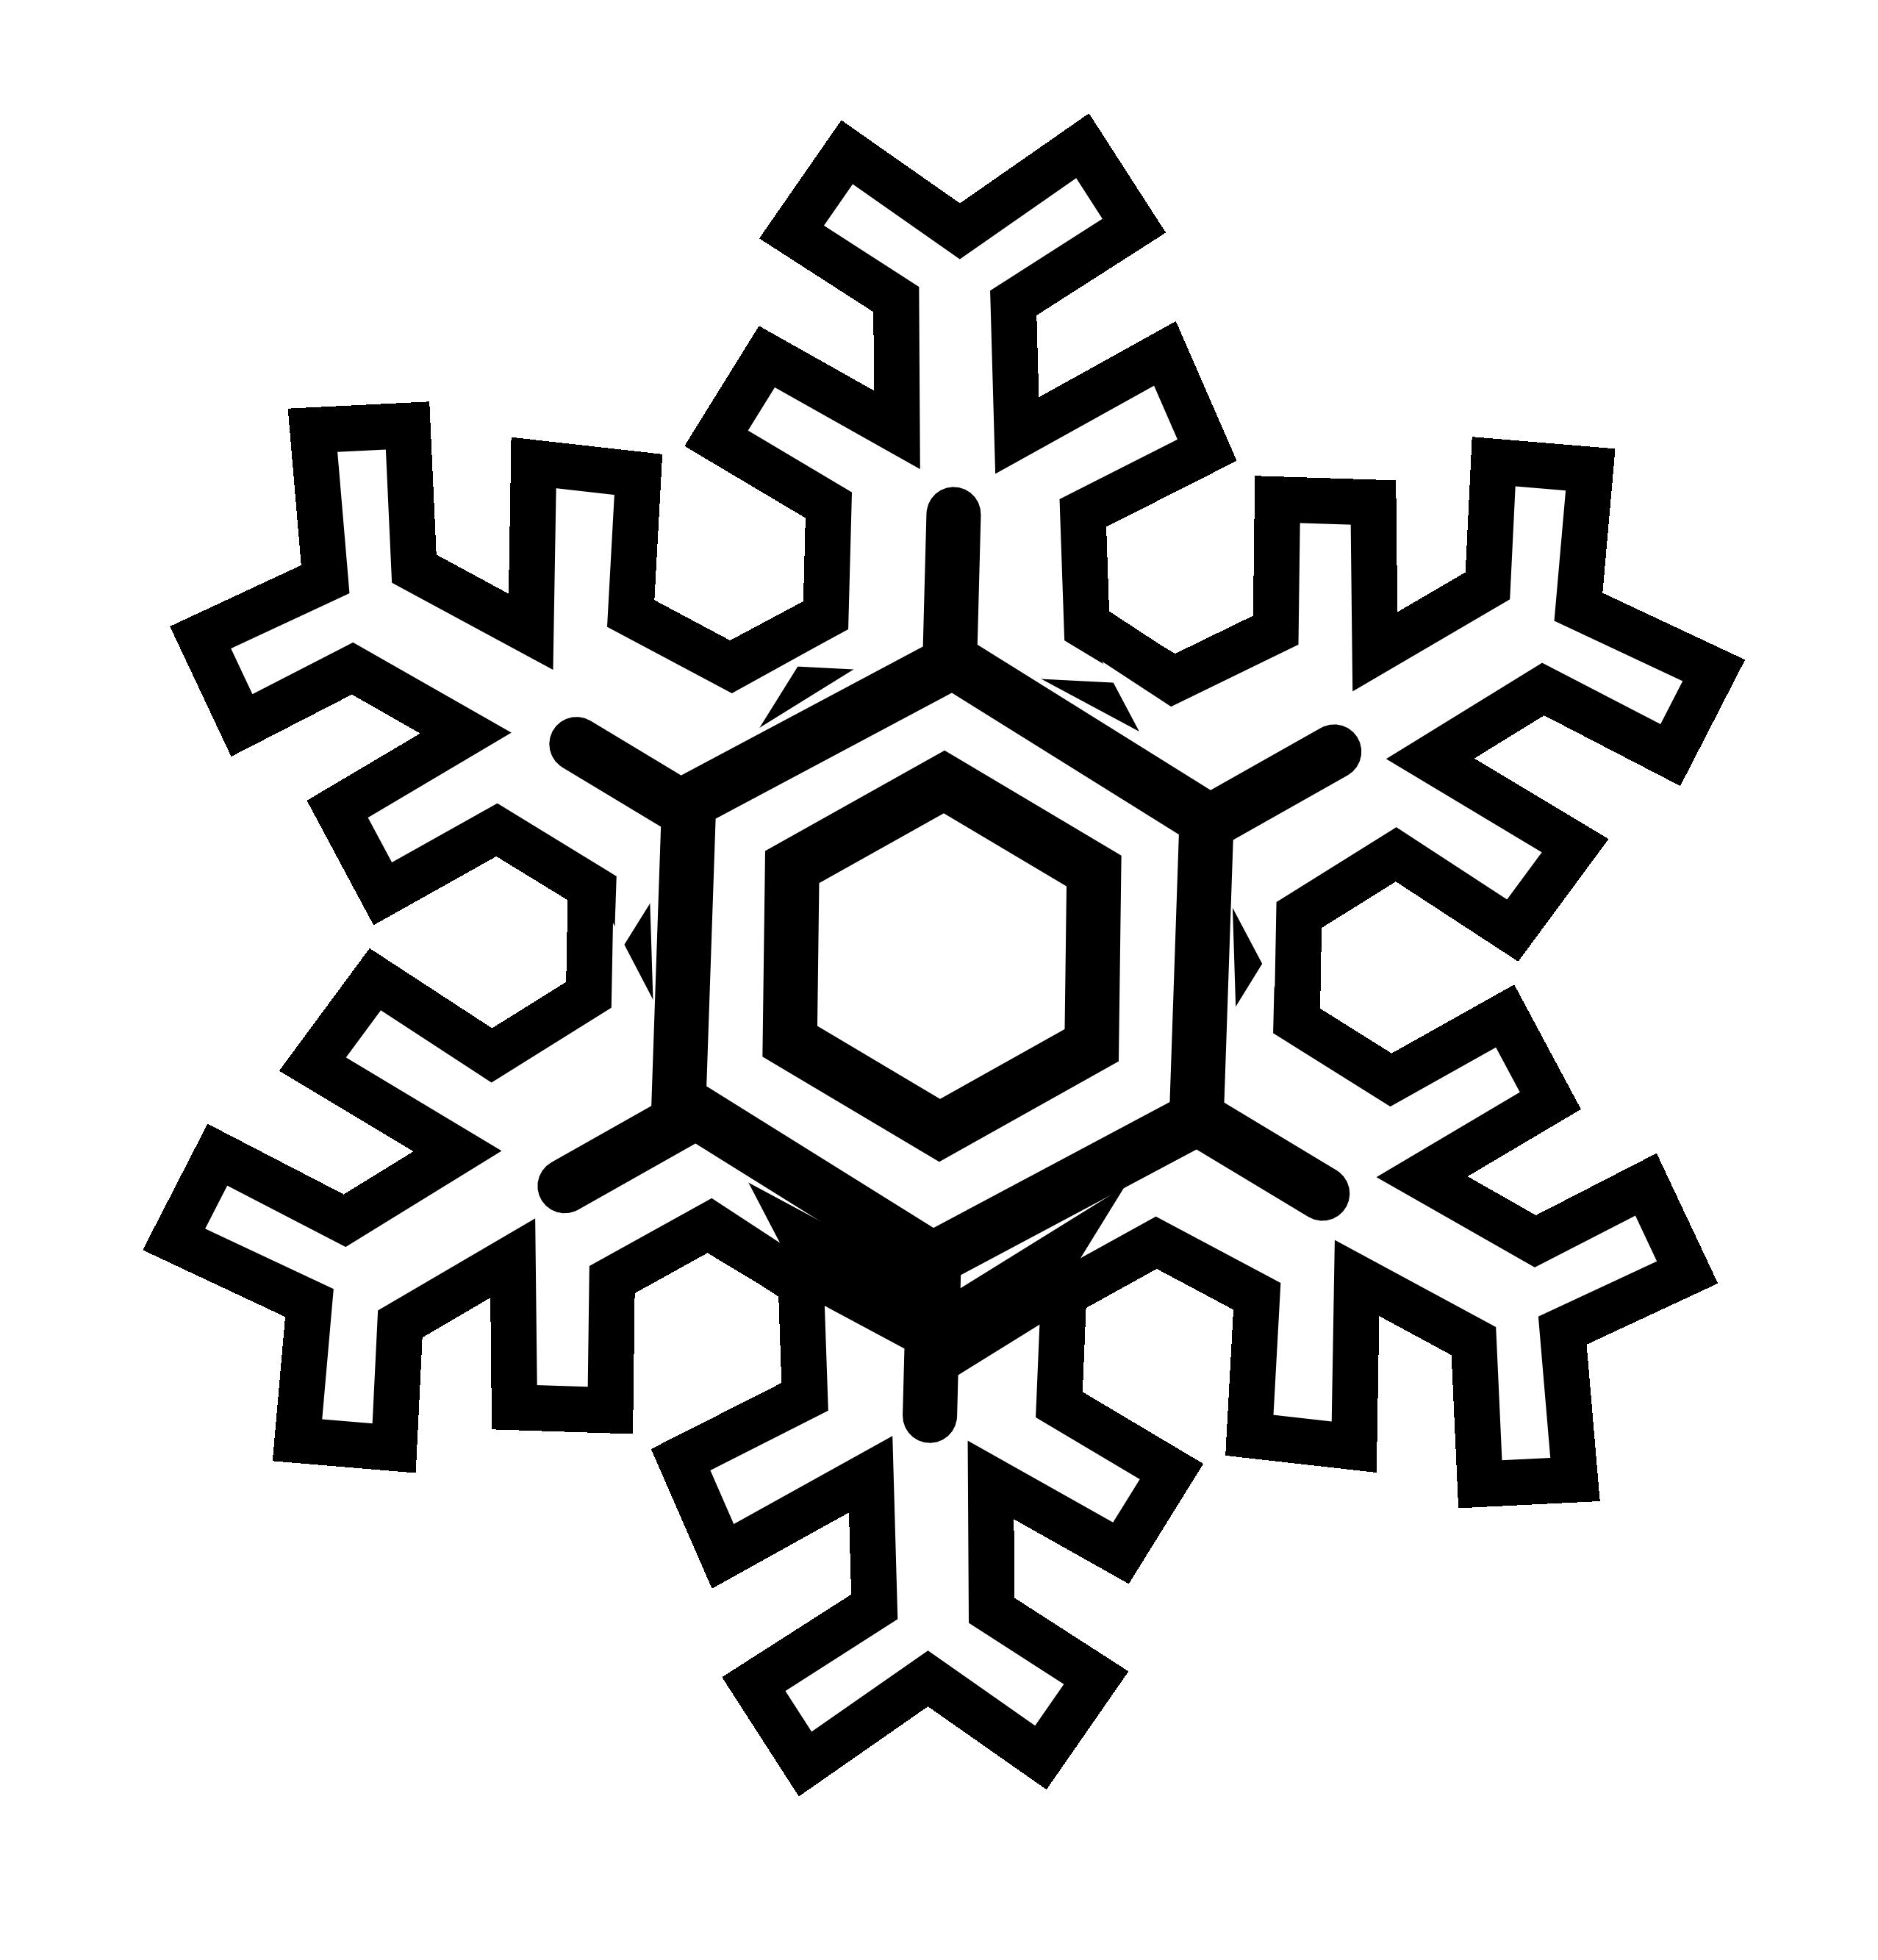 2555x2666 Snowflake Clipart Black And White Clipart Panda